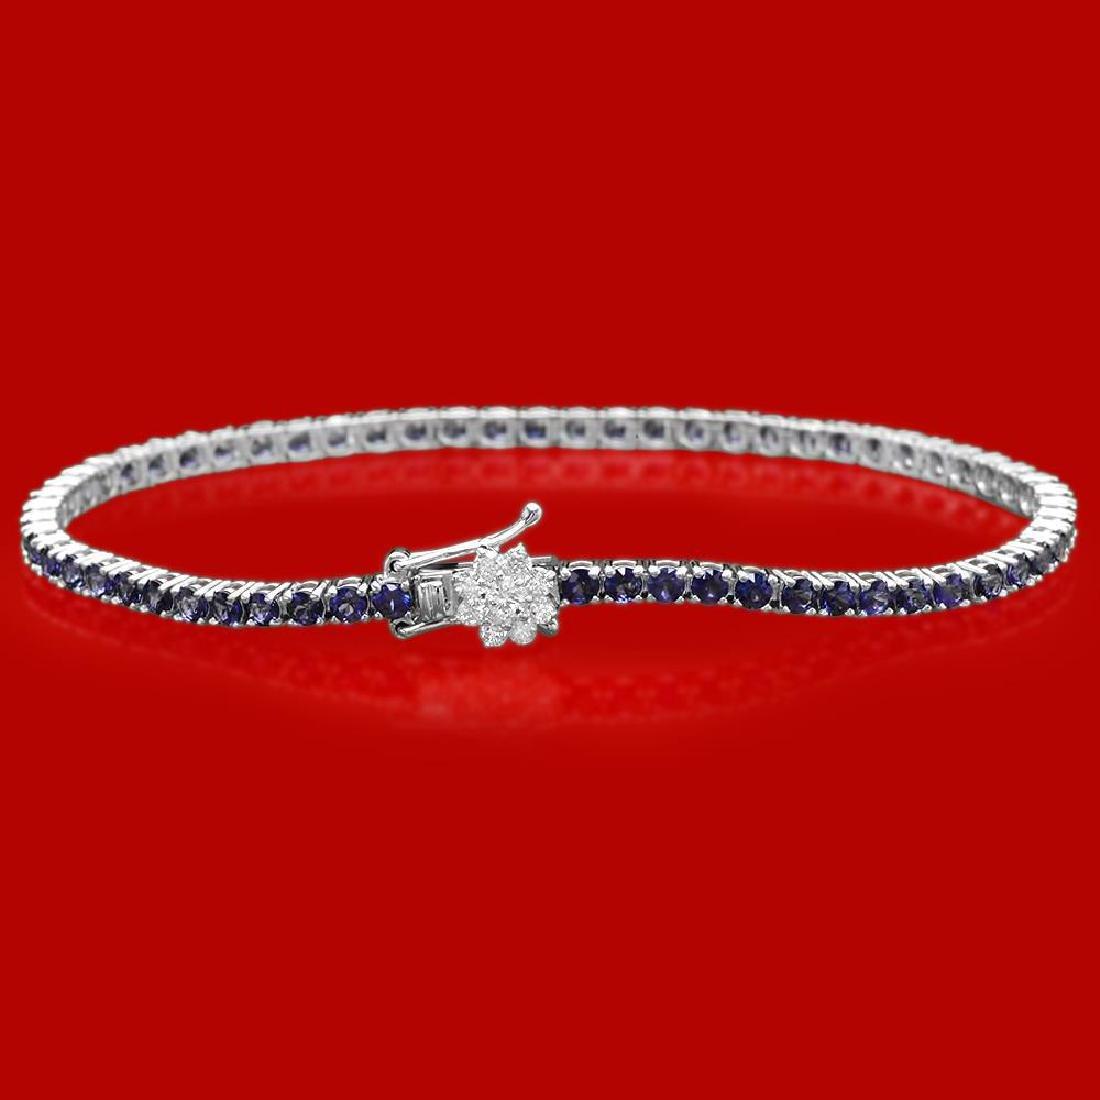 14k Gold 4.54ct Sapphire 0.40ct Diamond Bracelet - 2